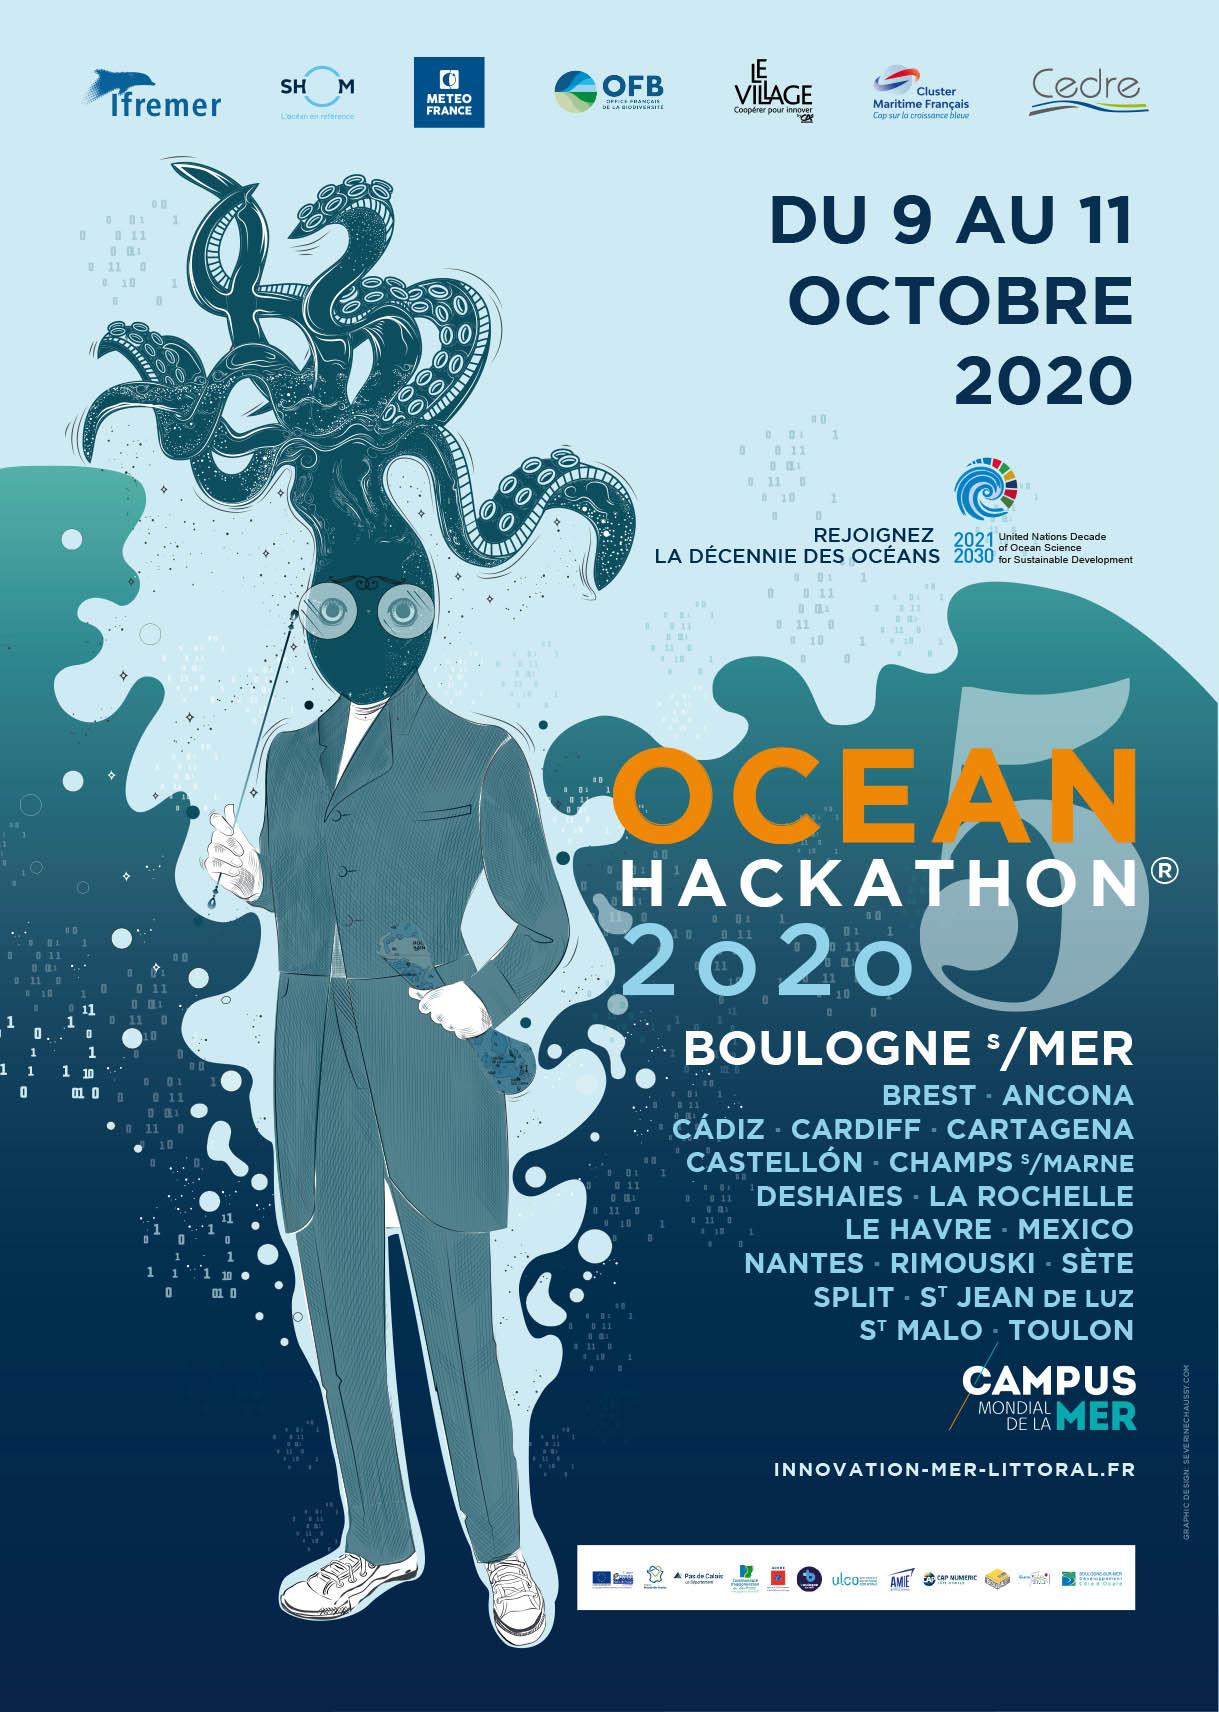 Ocean Hackathon 2020 boulogne brest